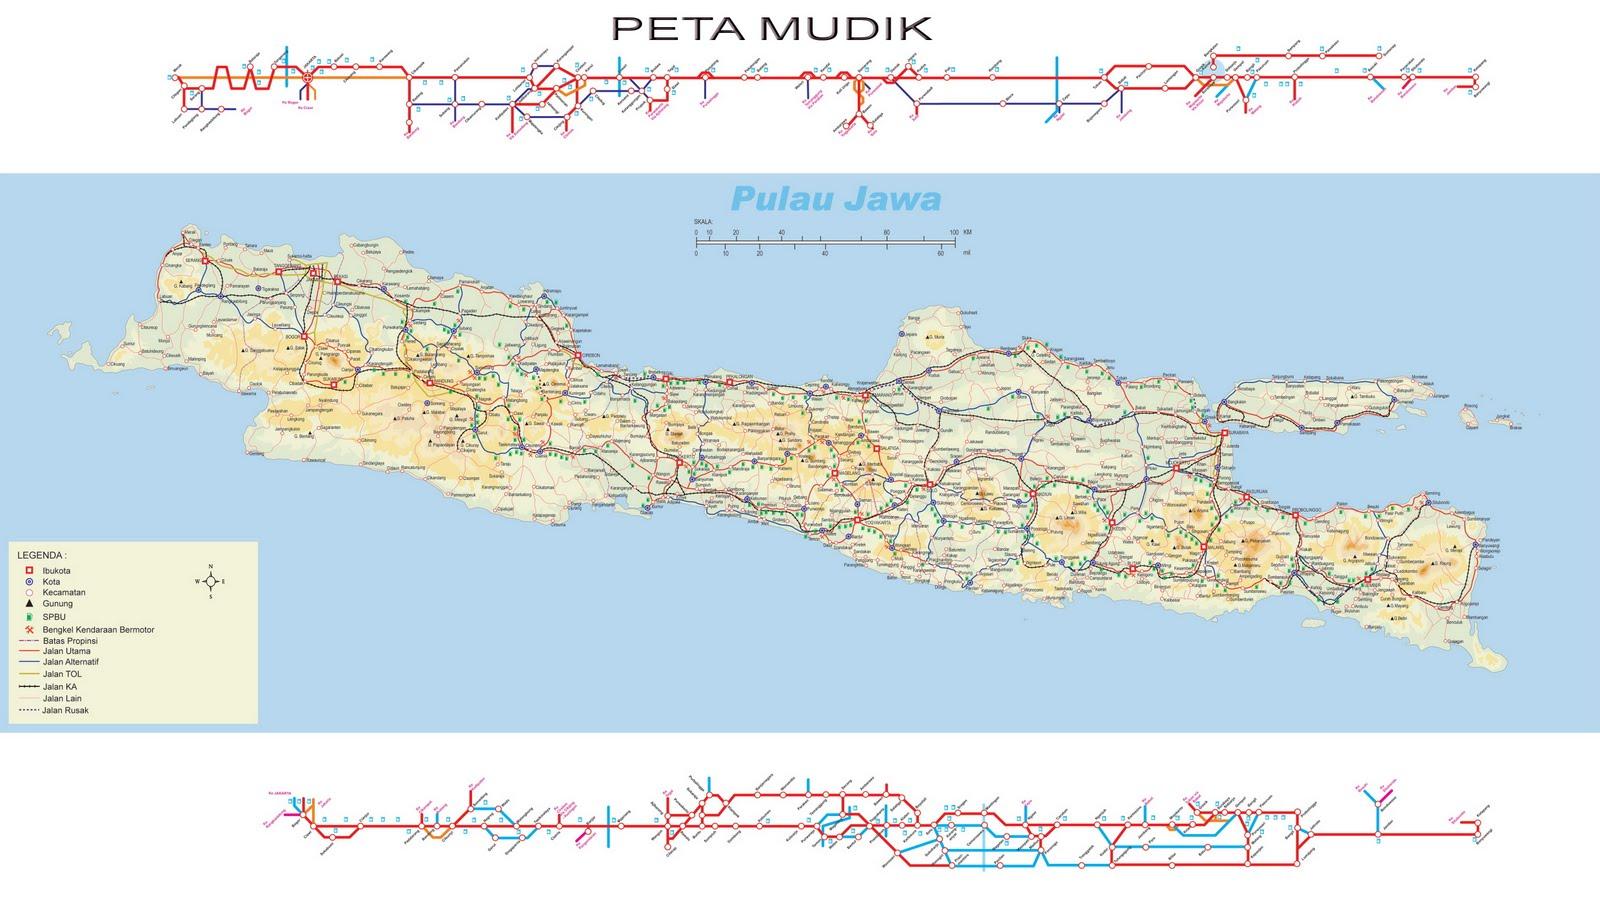 Peta Kota Mudik Pulau Jawa